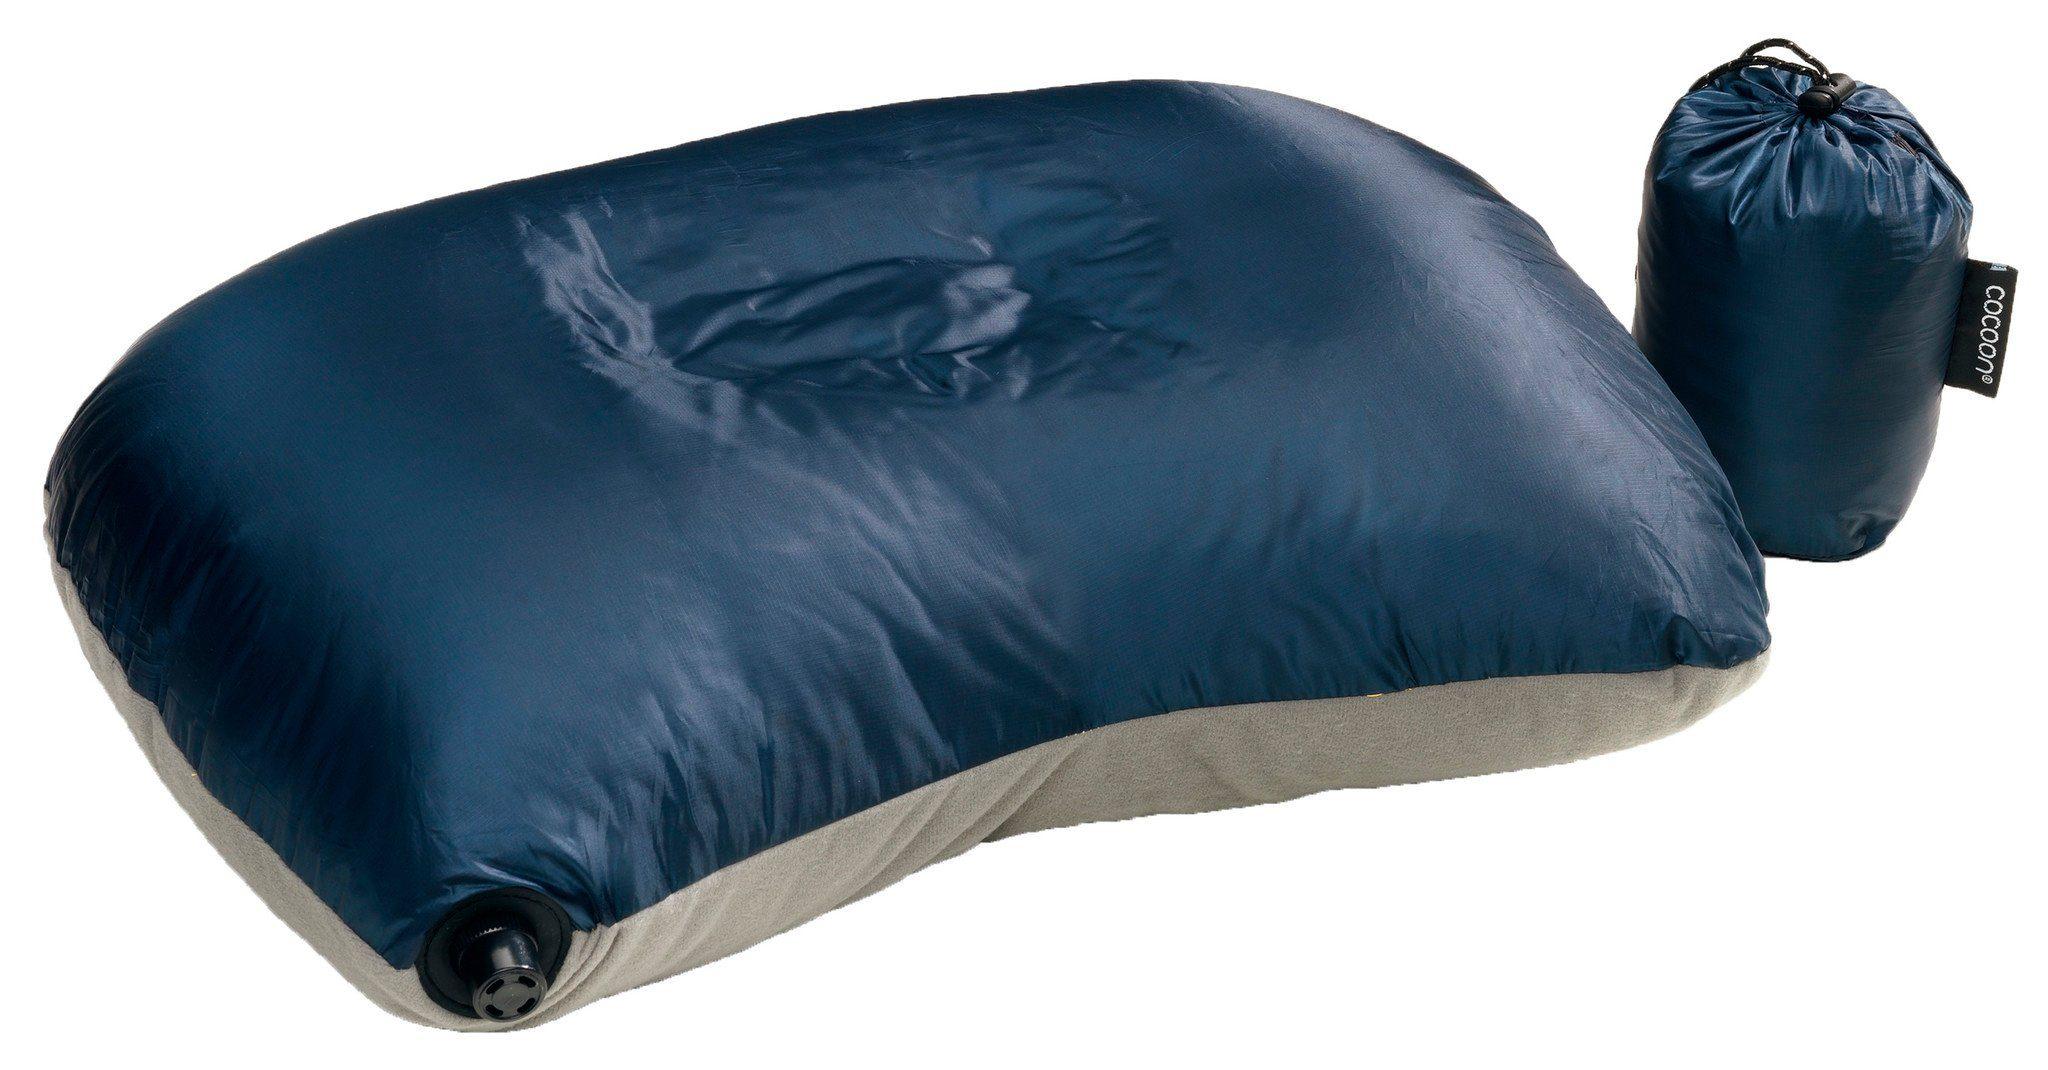 Cocoon Reisekissen »Cocoon Air Core Down Travel Pillow«